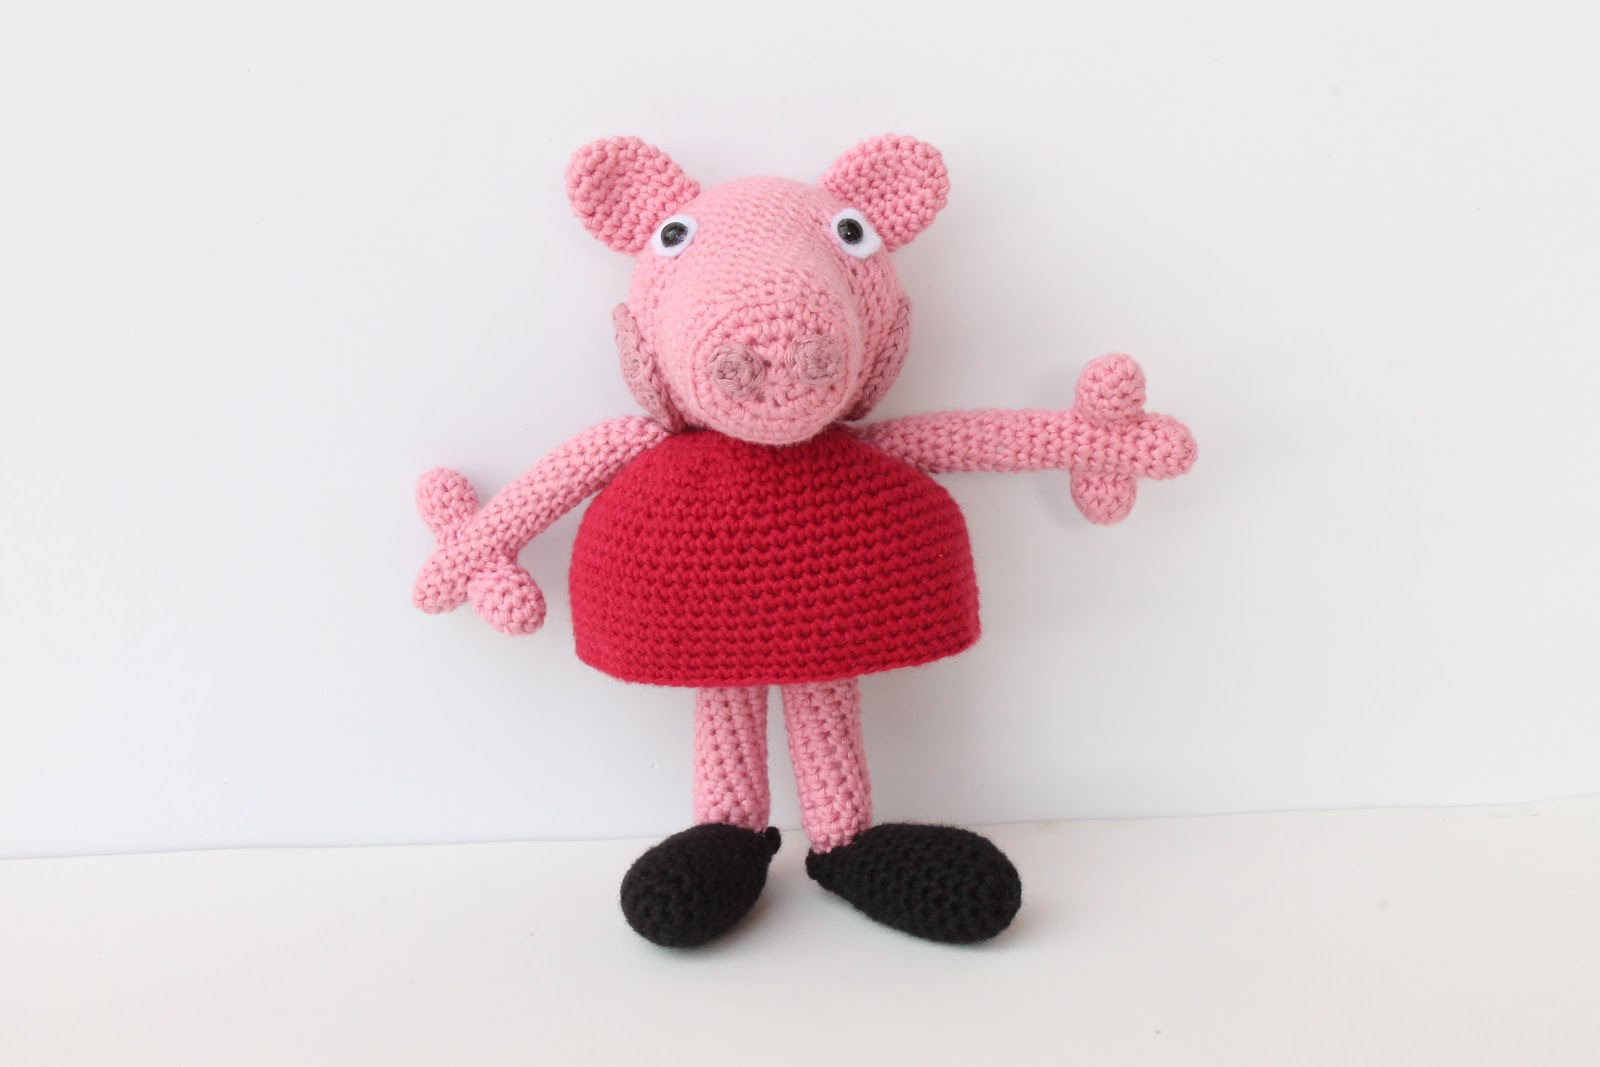 Peppa pig, pigs, George, Mr. Dinosaur, crochet toys, Свинка Пеппа ...   1067x1600